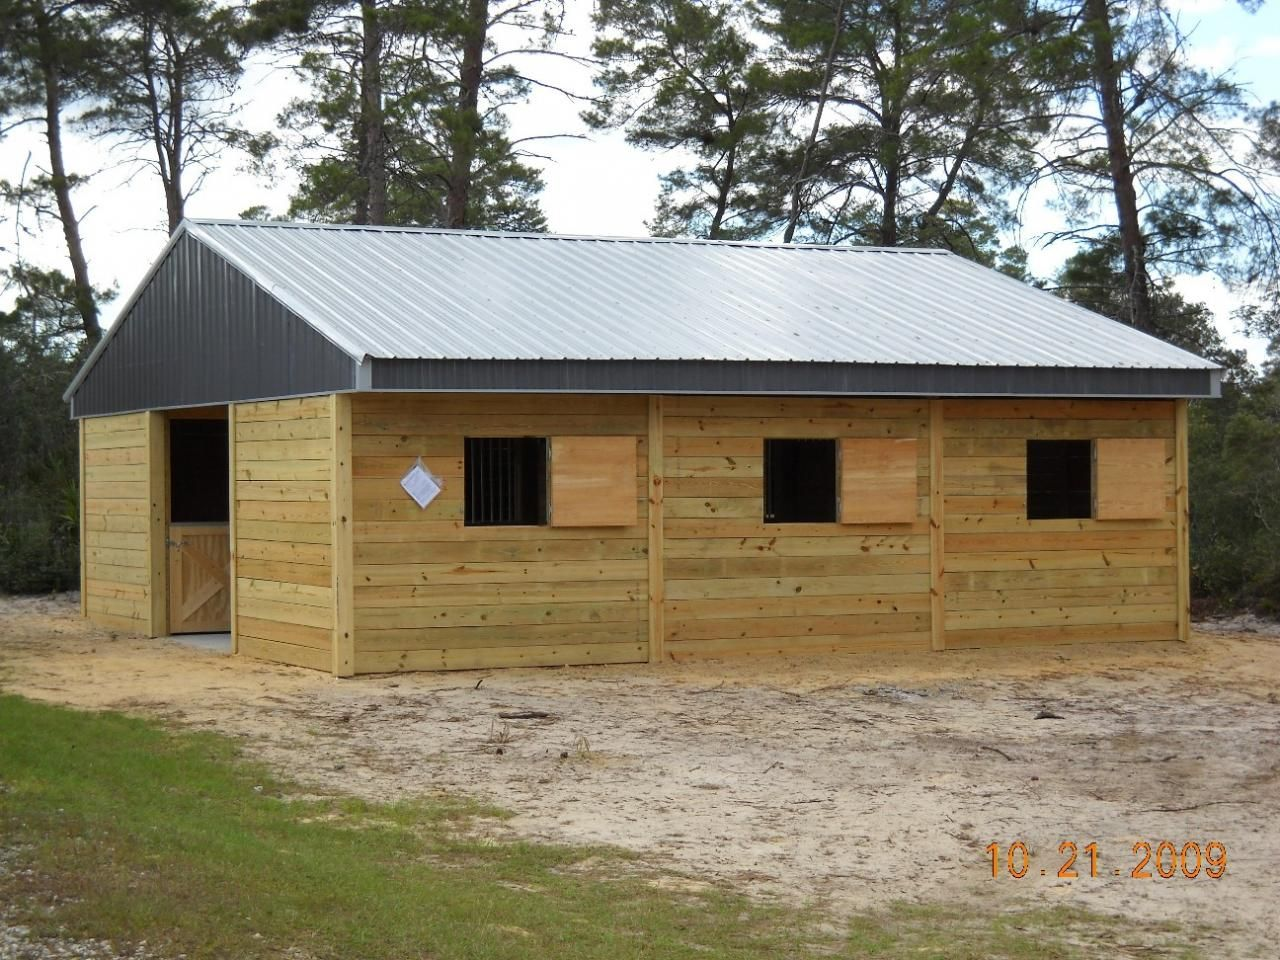 Center Aisle 6 Stalls Moms New Ideas Pinterest American Horse Barns Barn And Horse